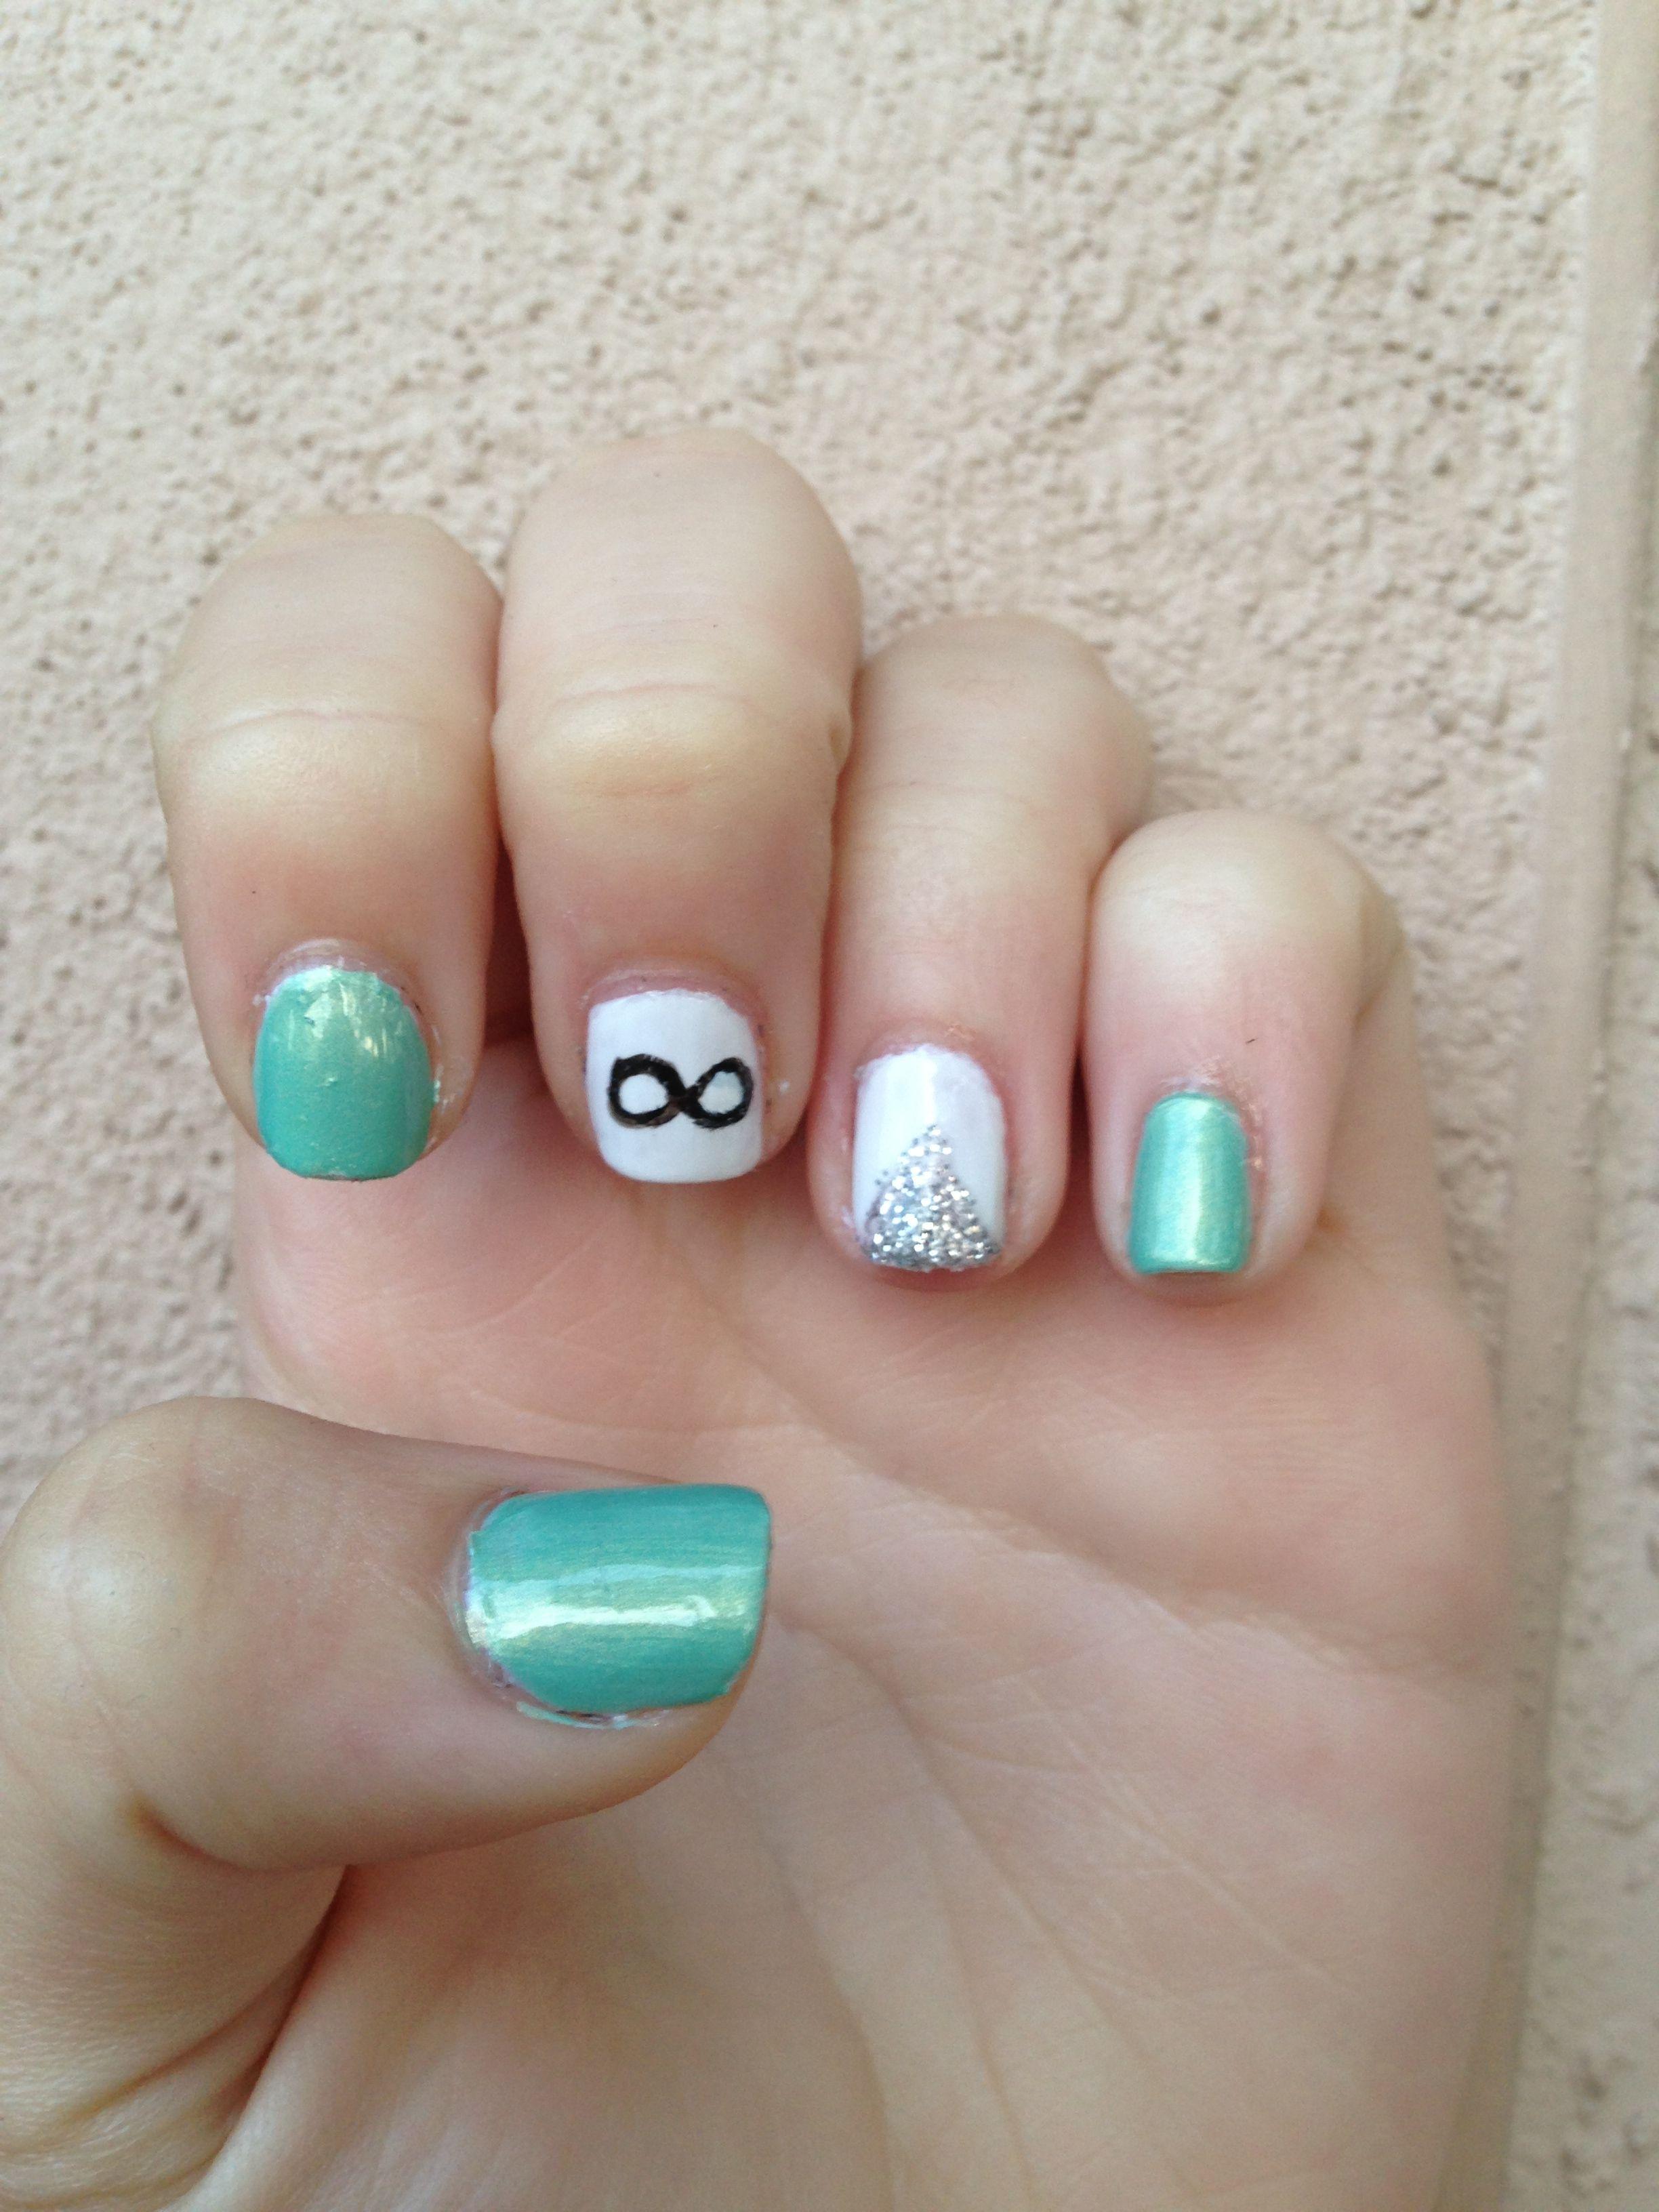 Infinity nail art | Nail Art | Pinterest | Infinity nails ...